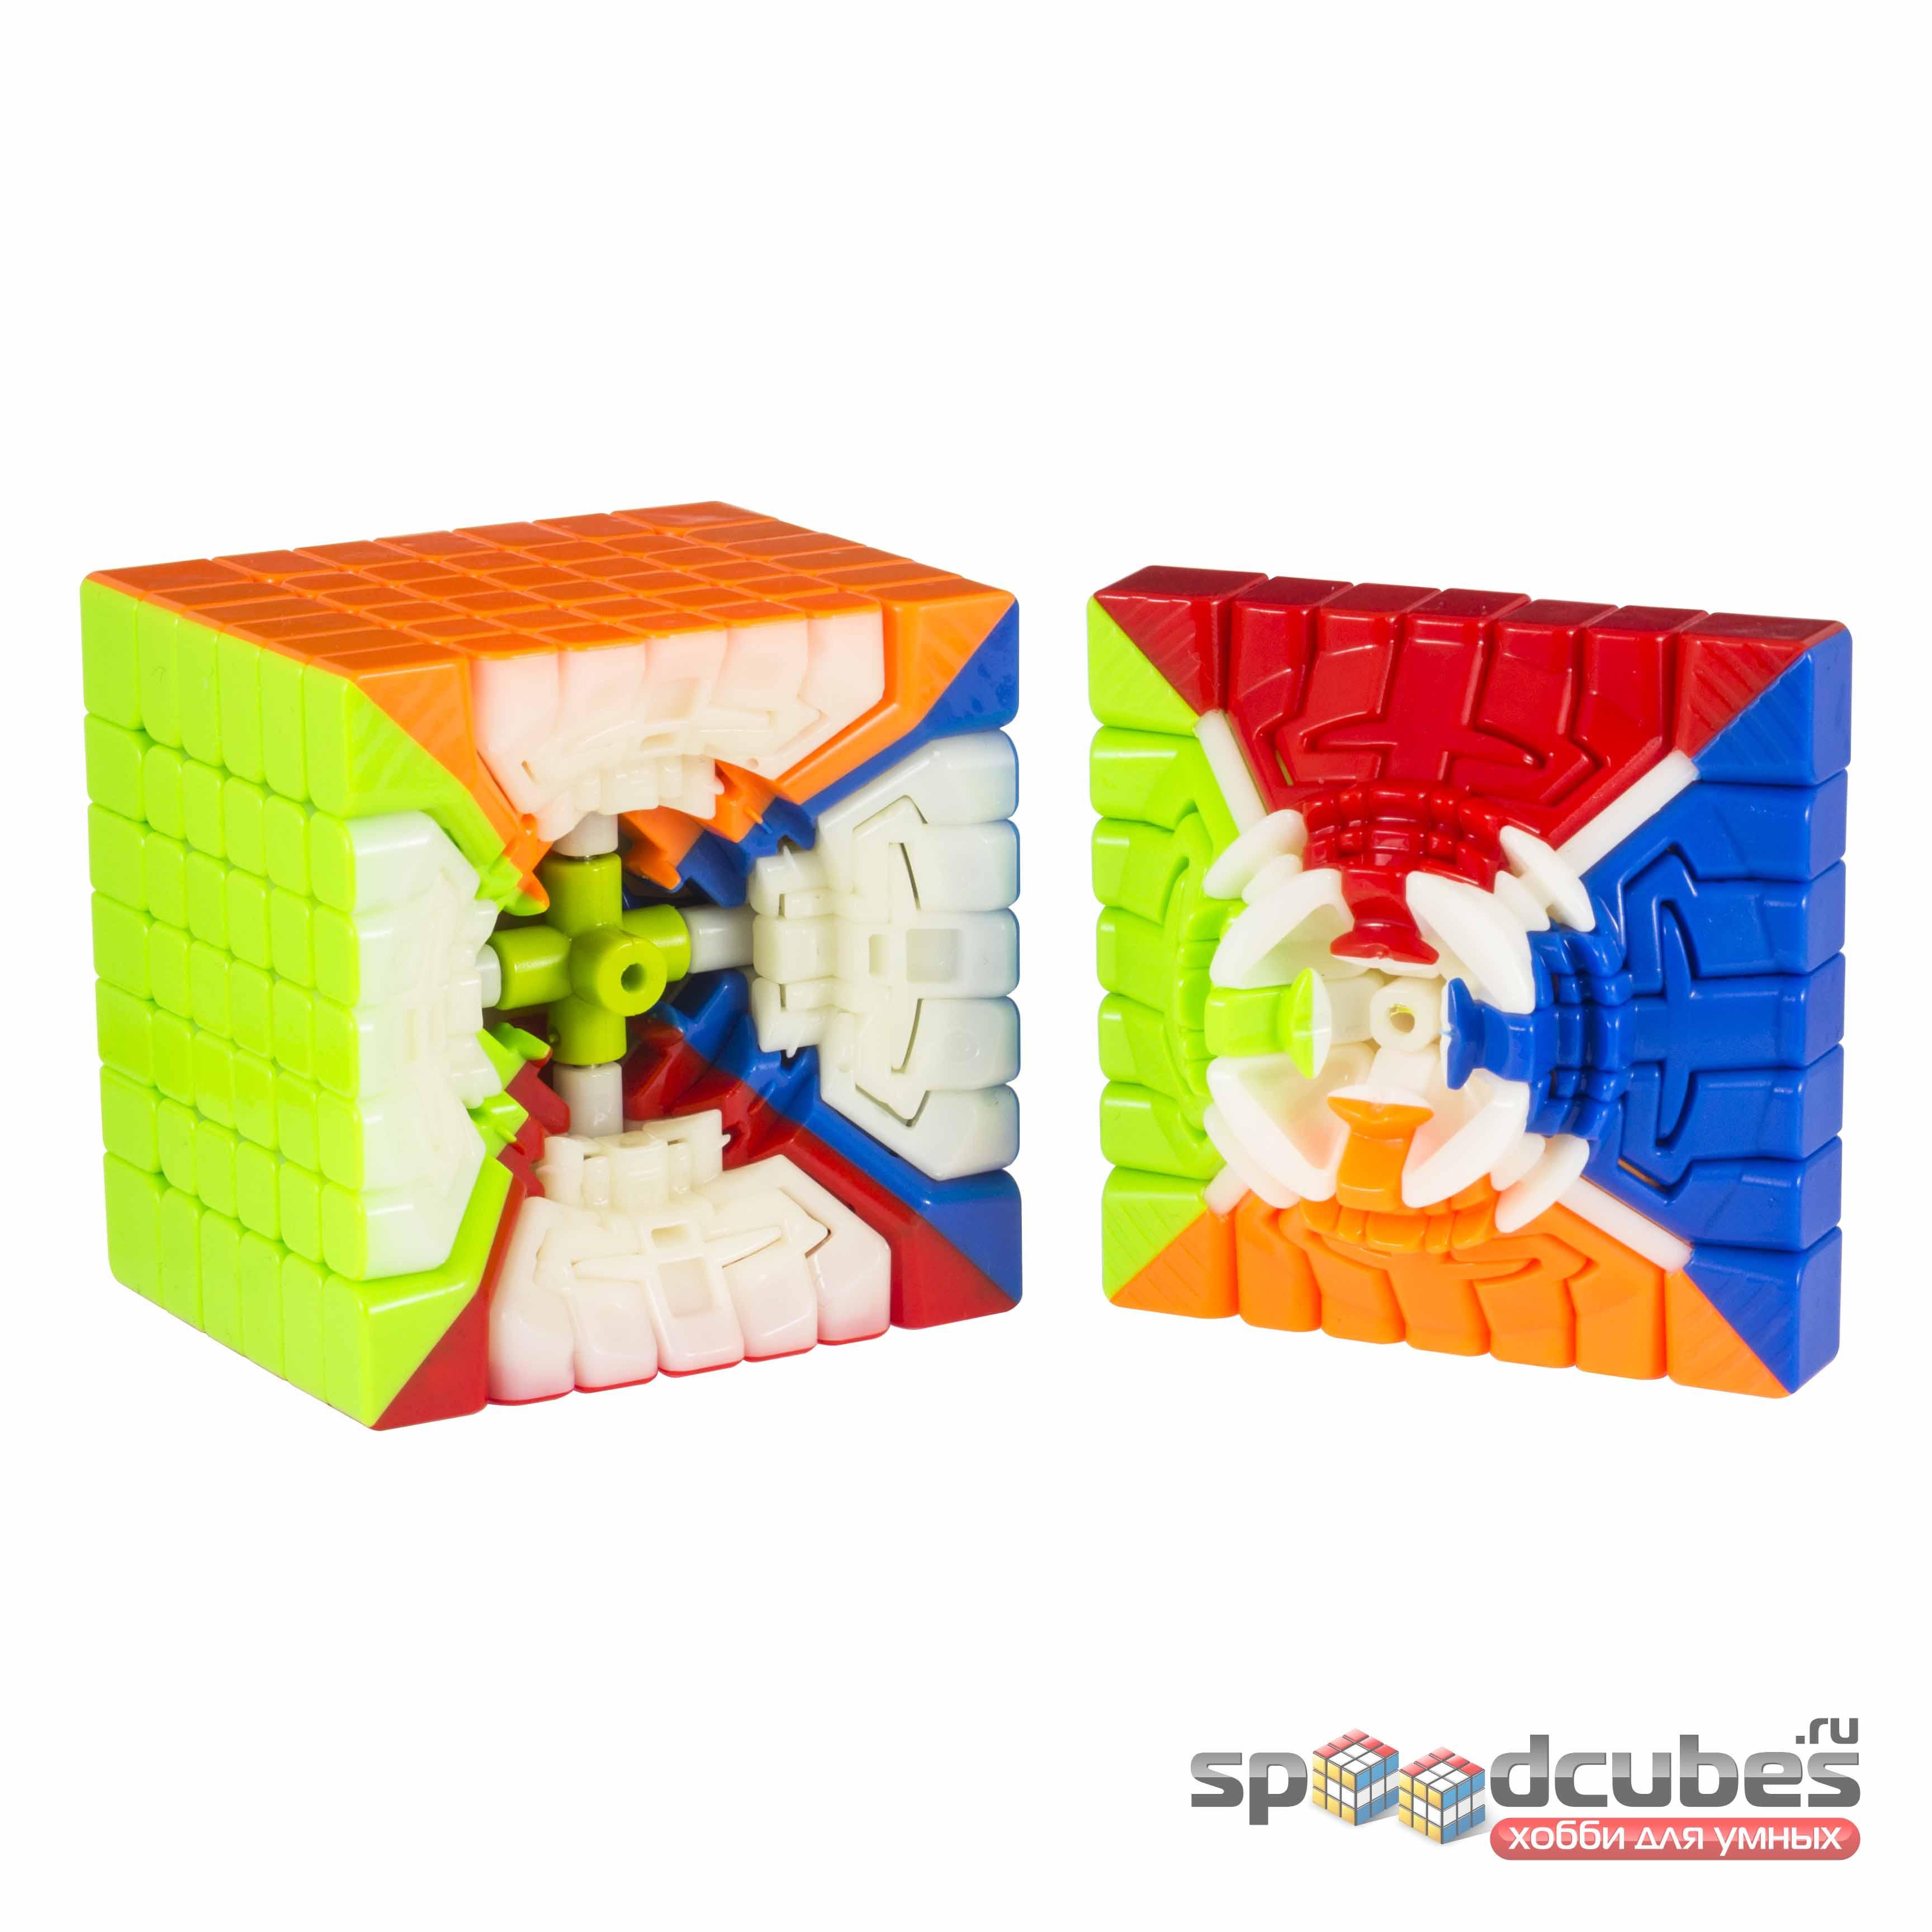 QiYi (MoFangGe) 7x7x7 Spark M Color 4